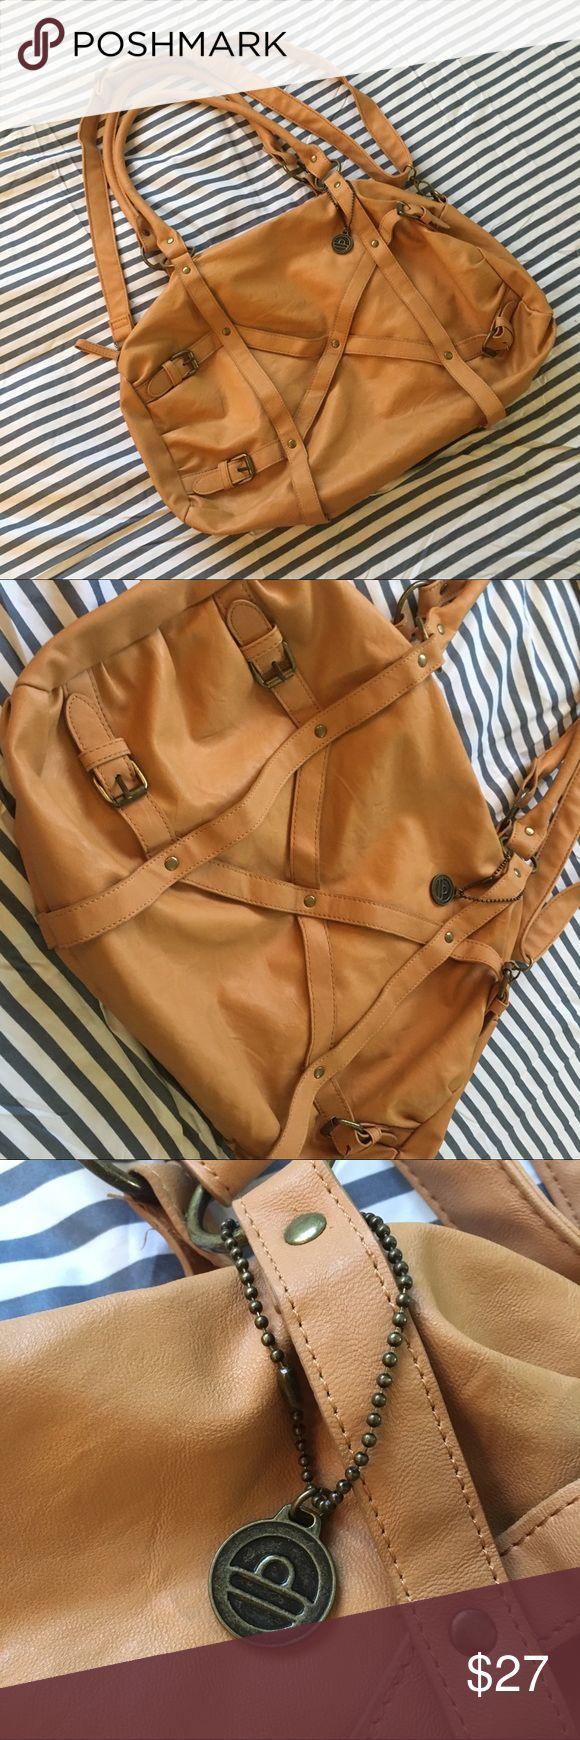 Big Buddha bag Camel color with a long shoulder strap and short shoulder straps. Worn once! Big Buddha Bags